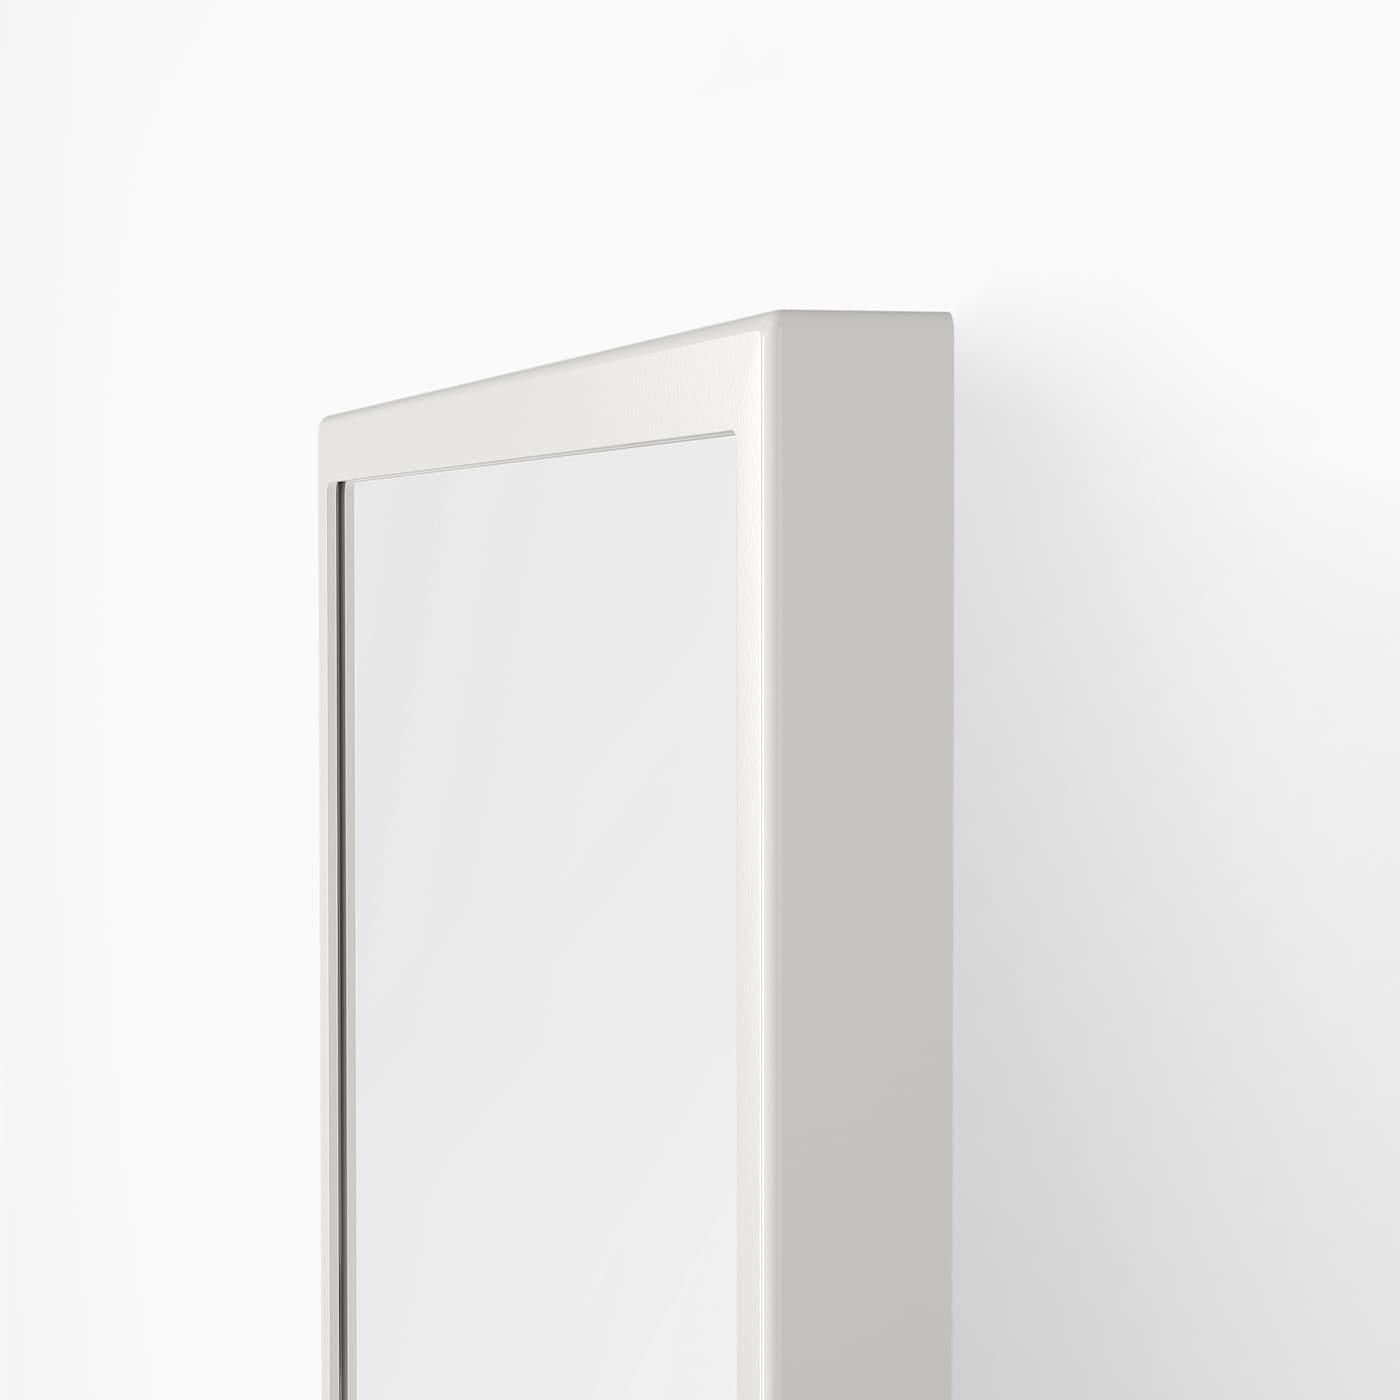 VENNESLA Floor mirror, white